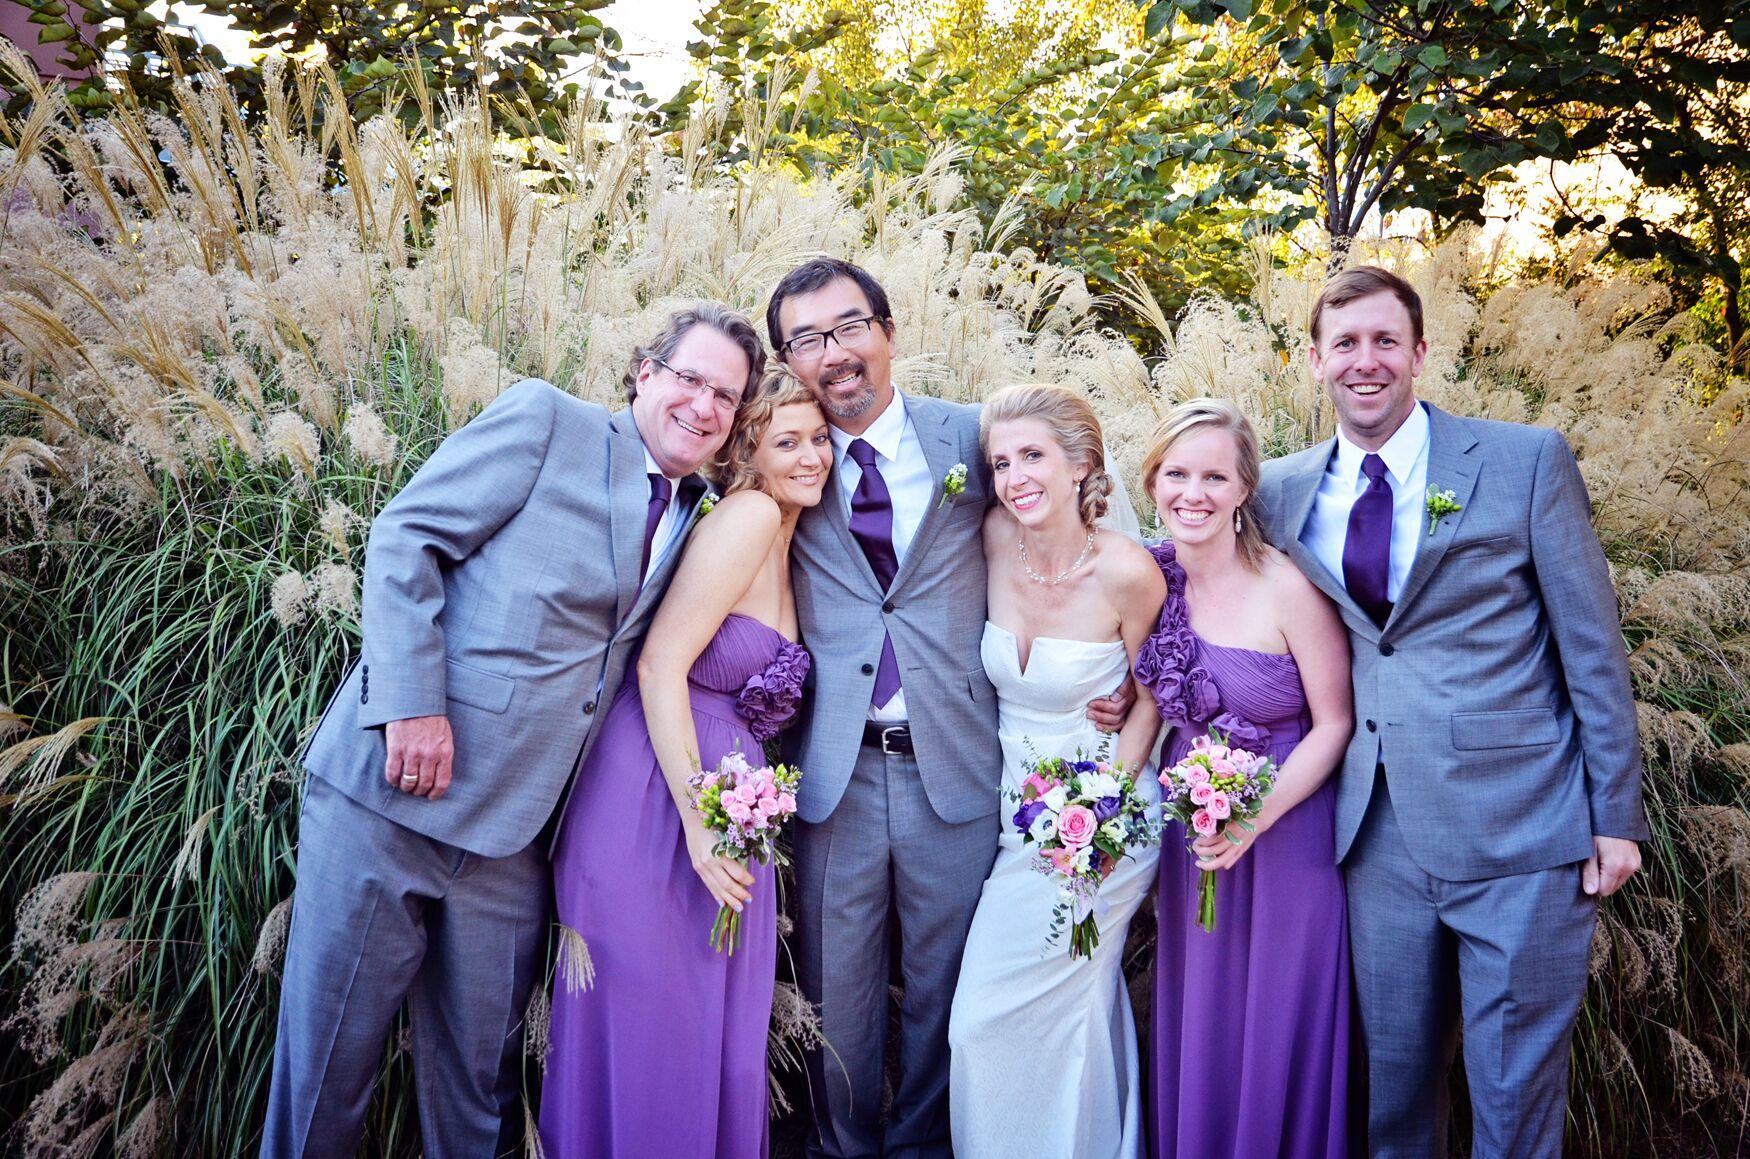 lilac bridesmaid and groom - HD1750×1159